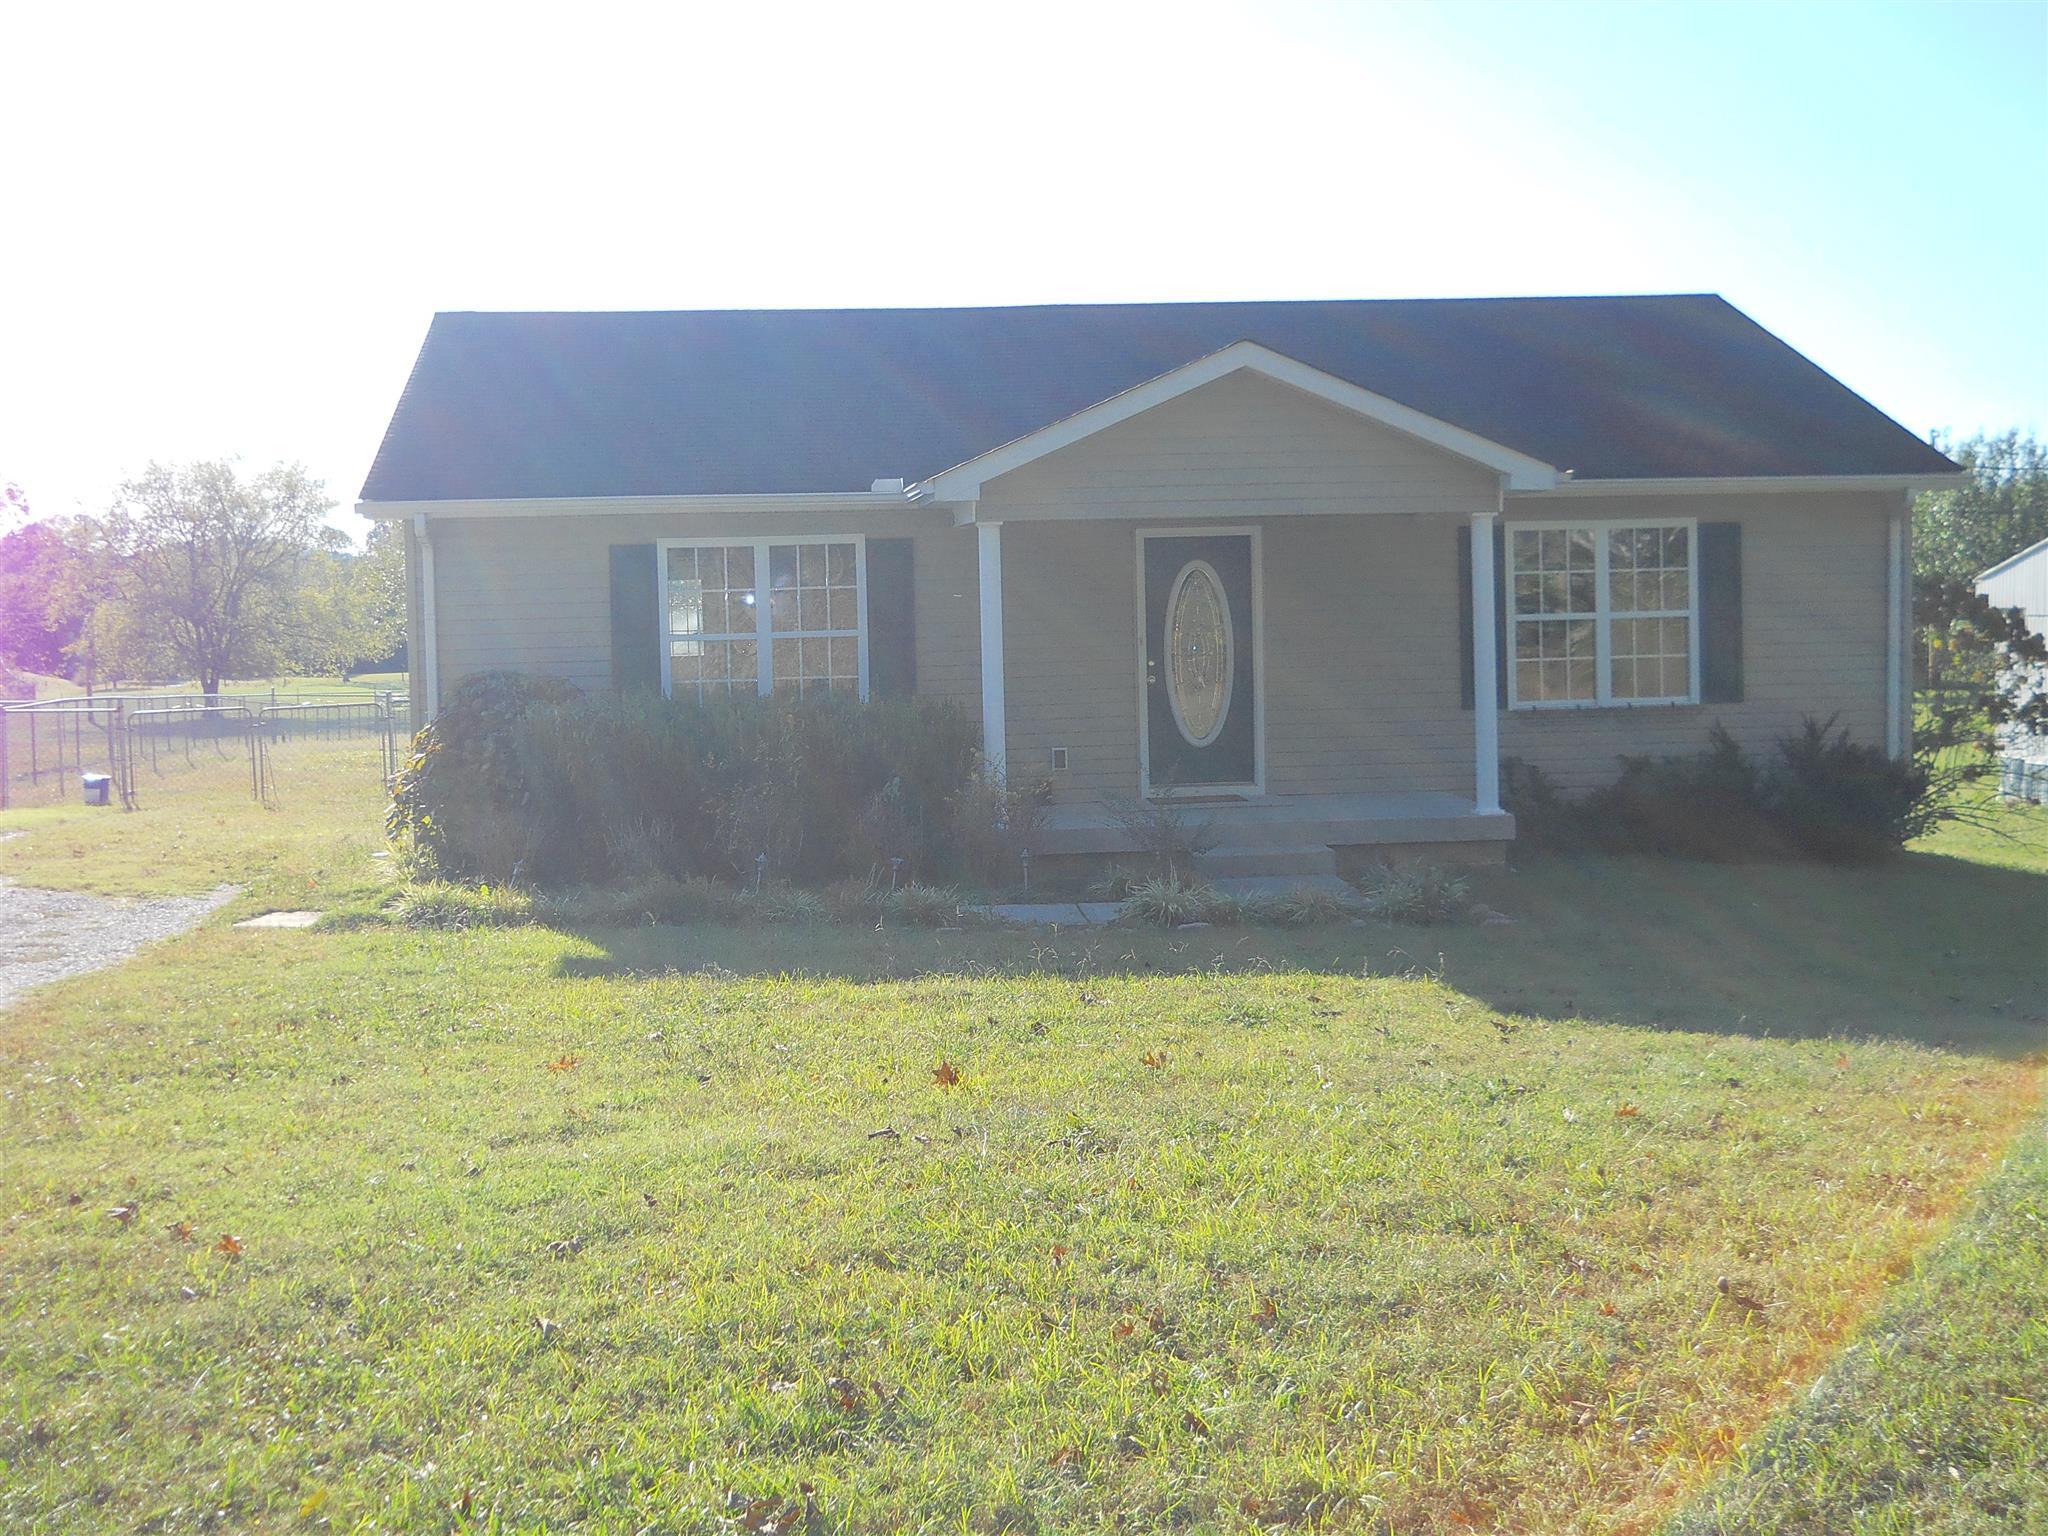 198 Sunset Blvd, Wartrace, TN 37183 - Wartrace, TN real estate listing